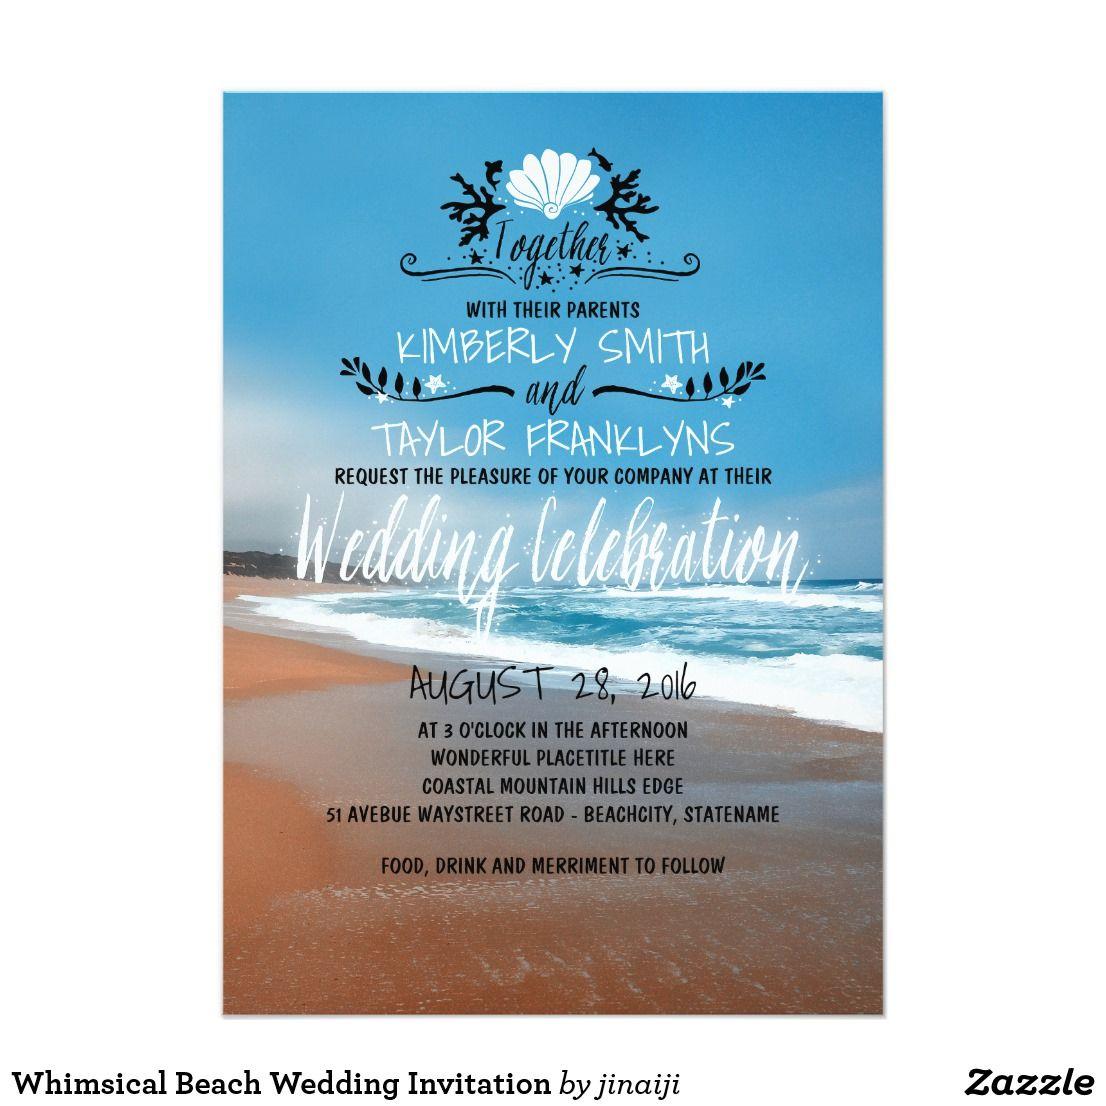 Whimsical Beach Wedding Invitation Beach Wedding Invitations